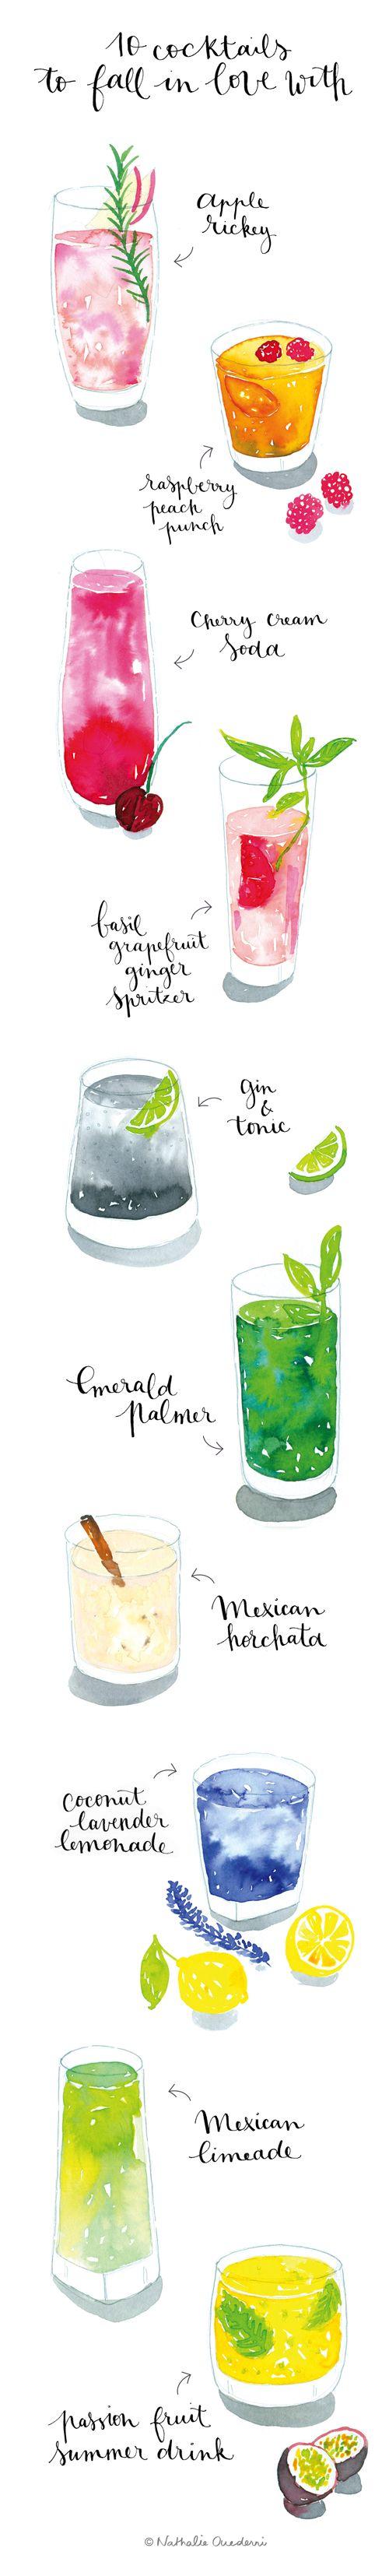 Food Illustration | watercolor cocktails by Nathalie Ouederni